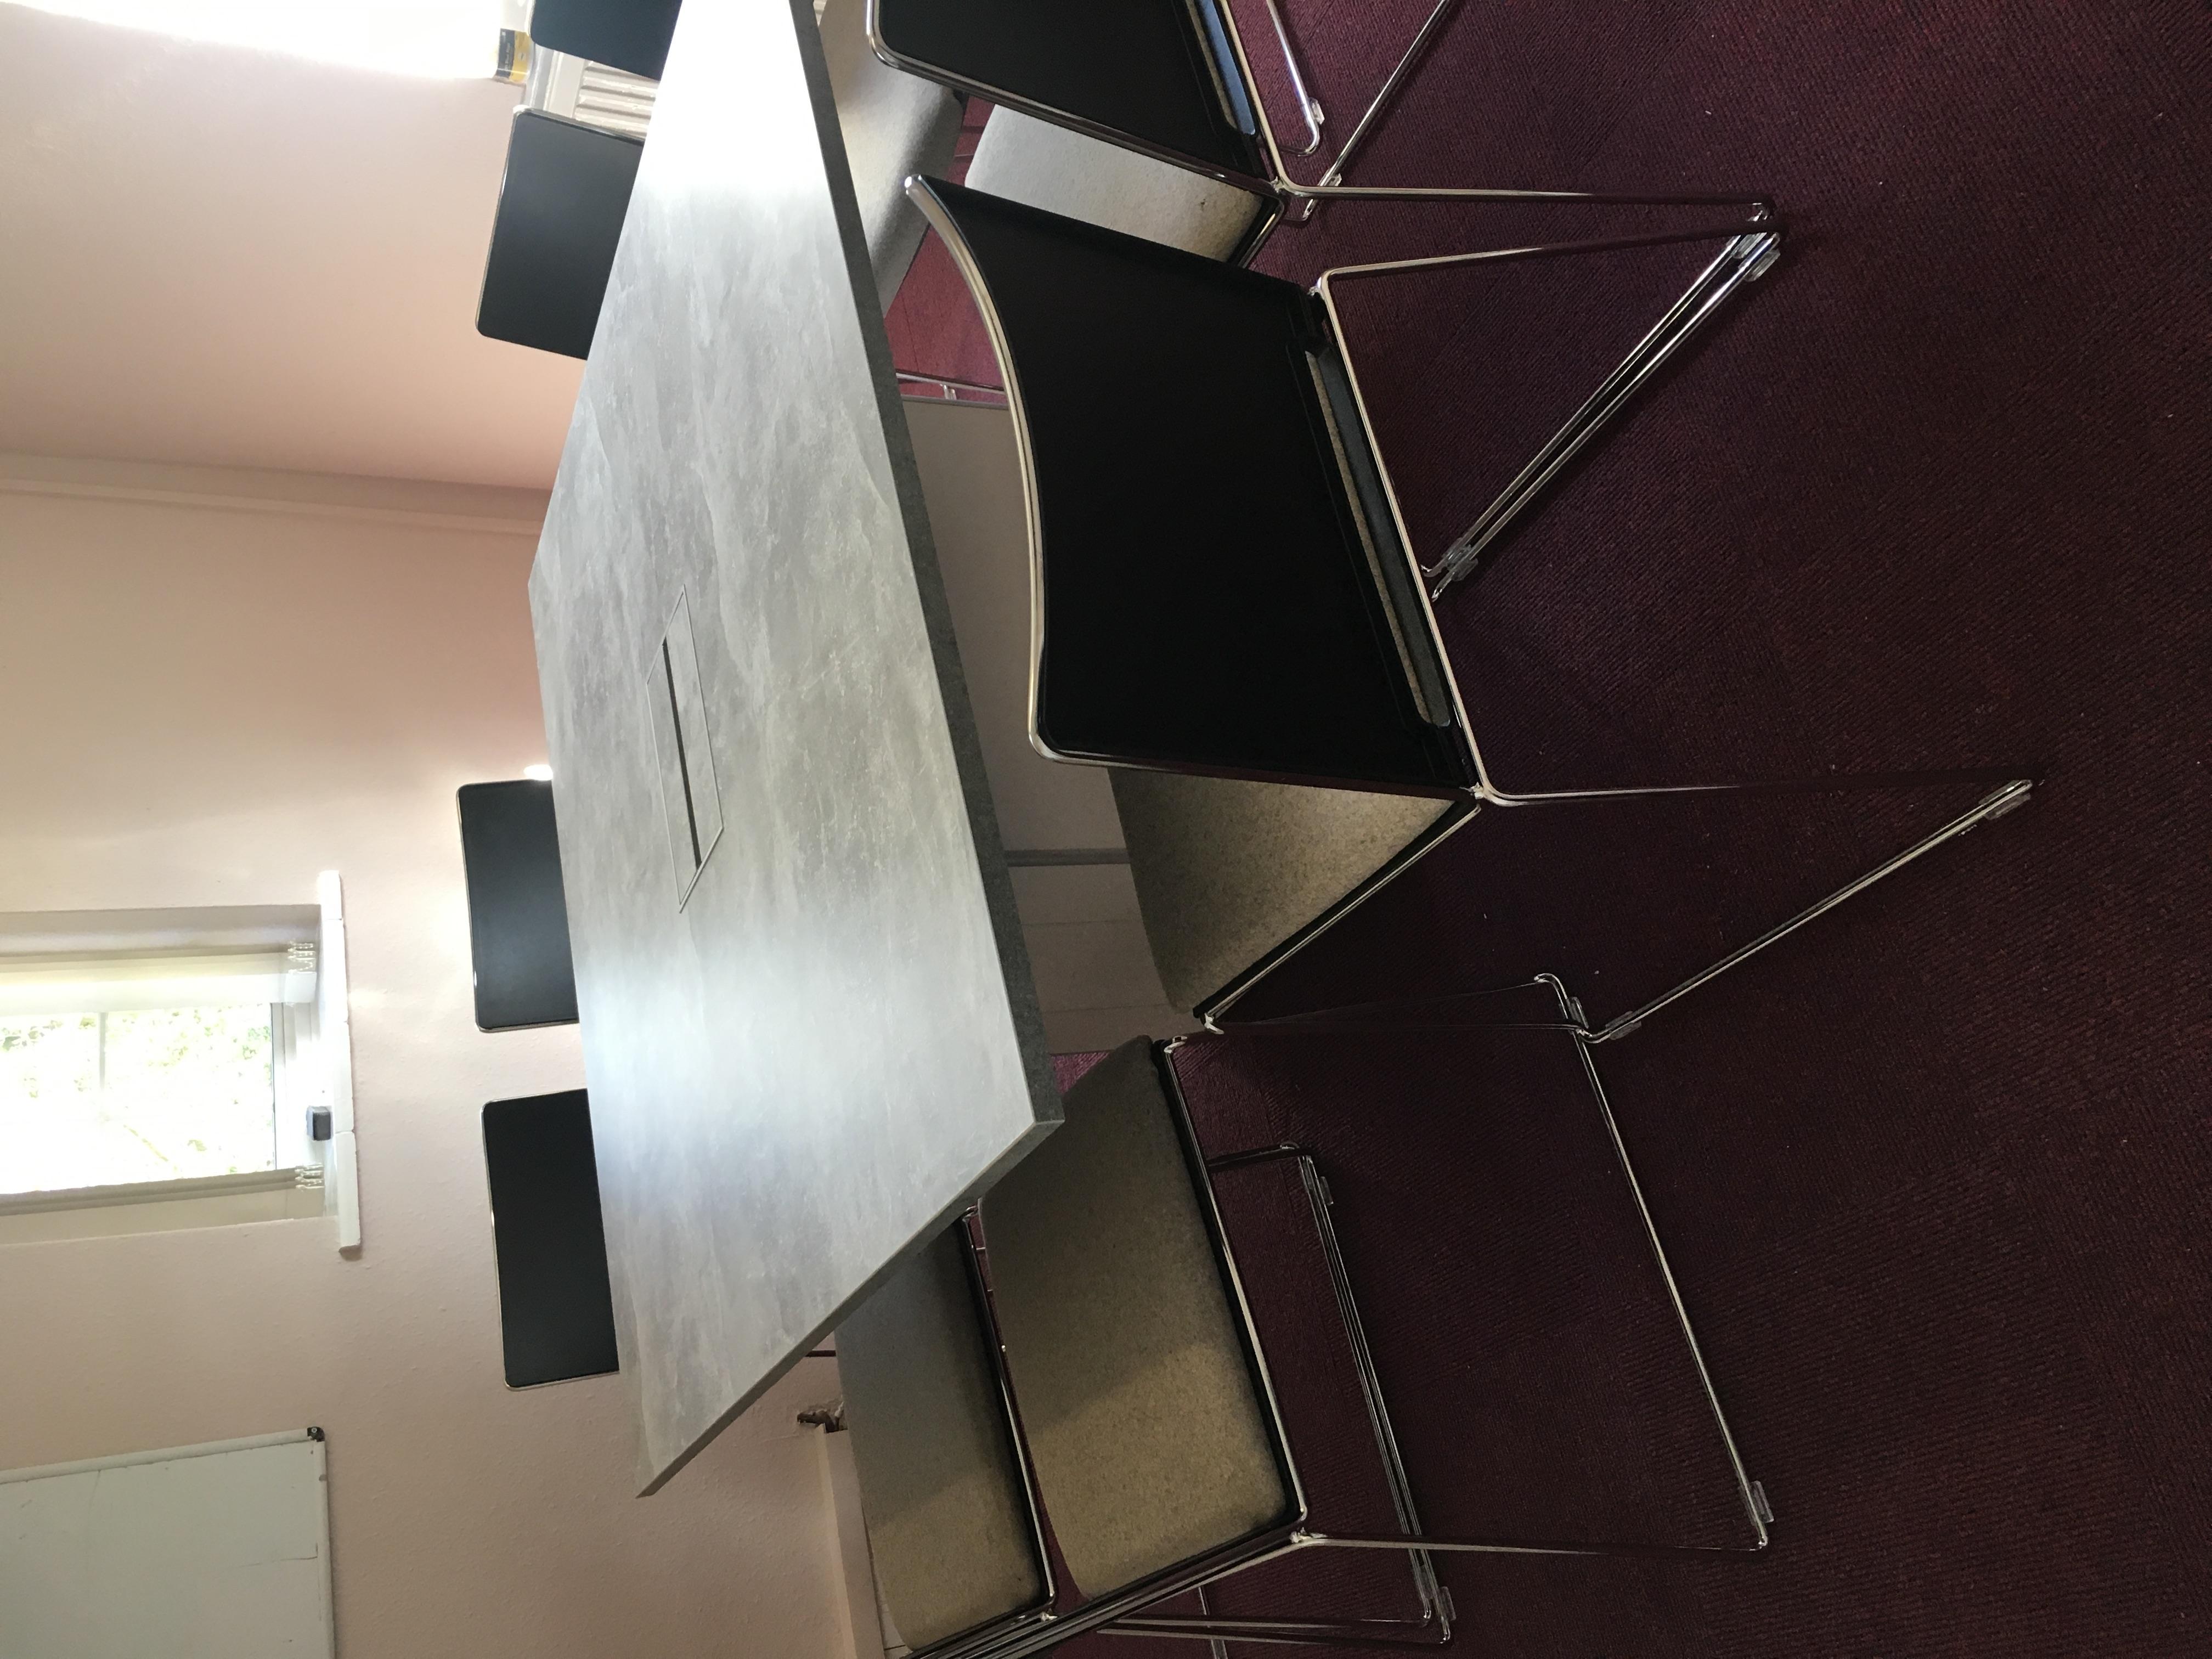 Ambus-Box-Base-Concrete-Meeting Table-In-Situ